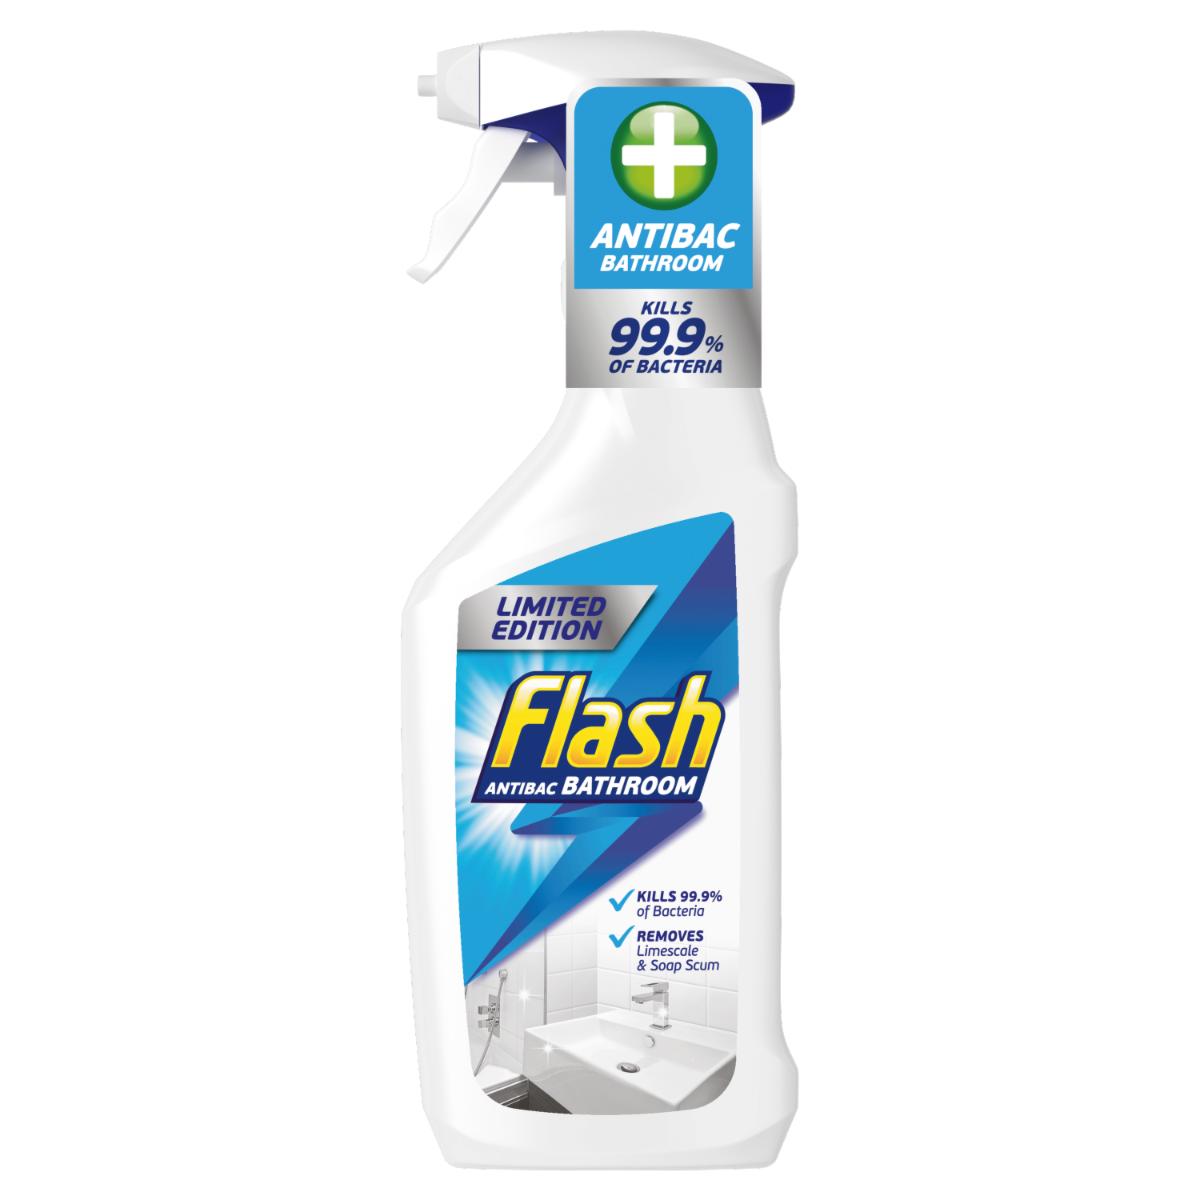 Flash Bathroom 3 in 1 Antibacterial Spray - 500ml